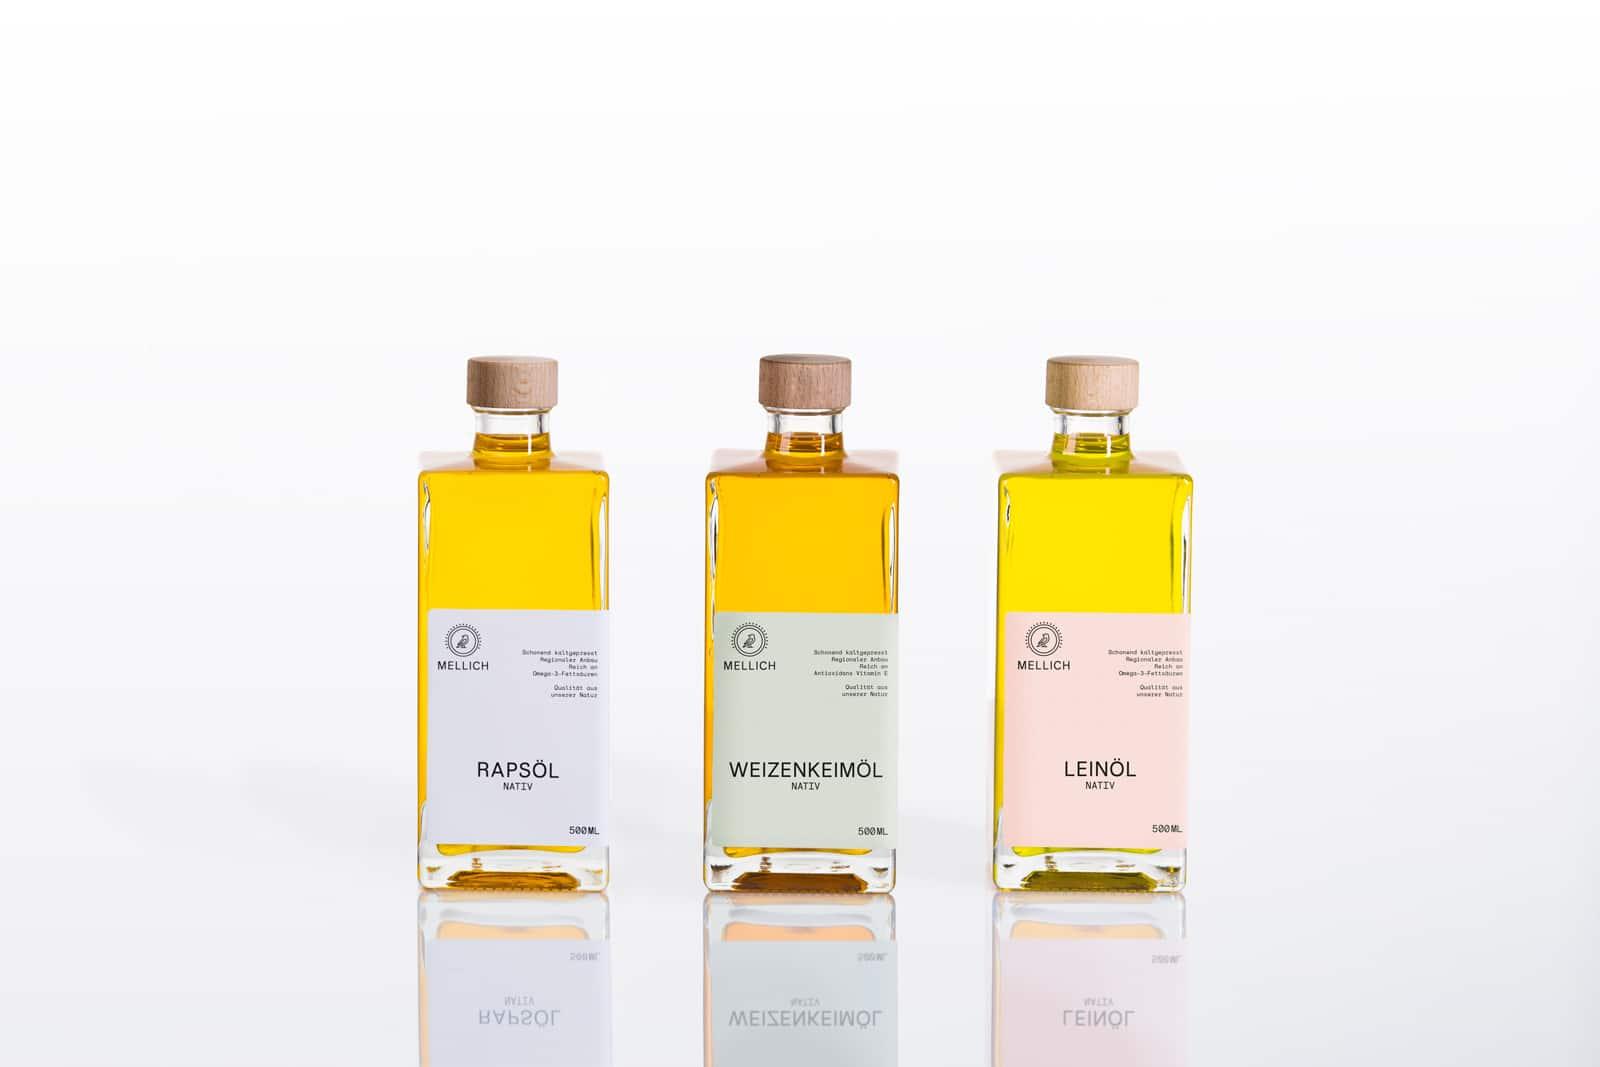 Mellich Öl Etikettendesign Rapsöl, Weizenkeimöl, Leinöl